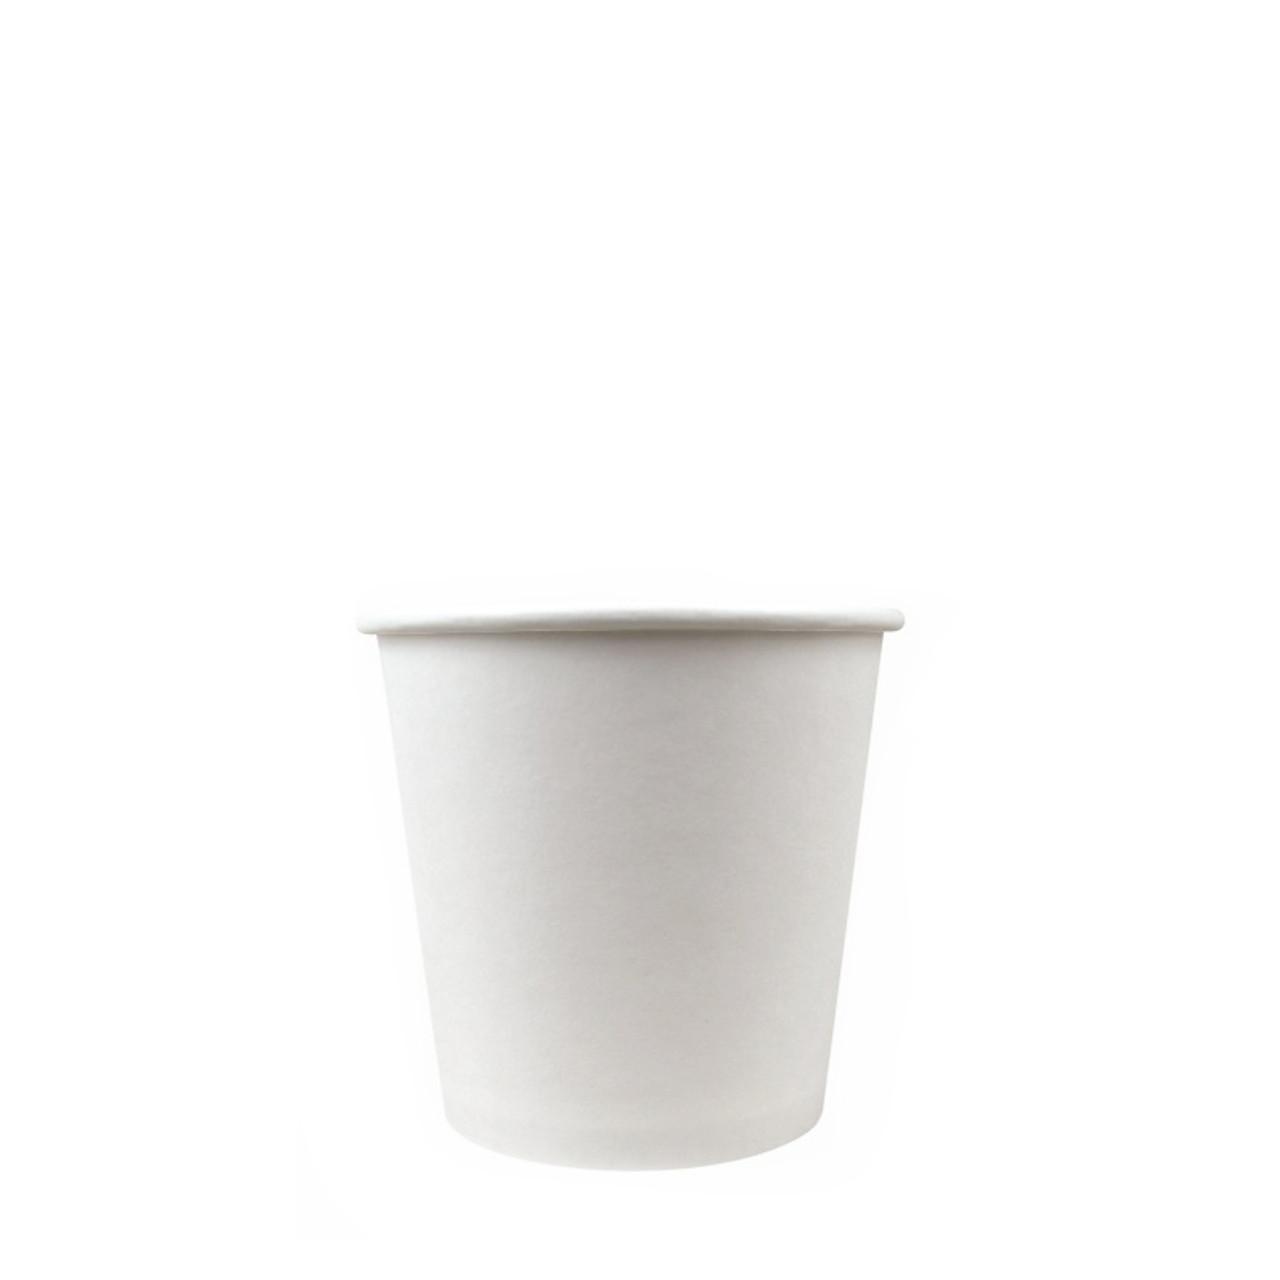 4oz white paper cup